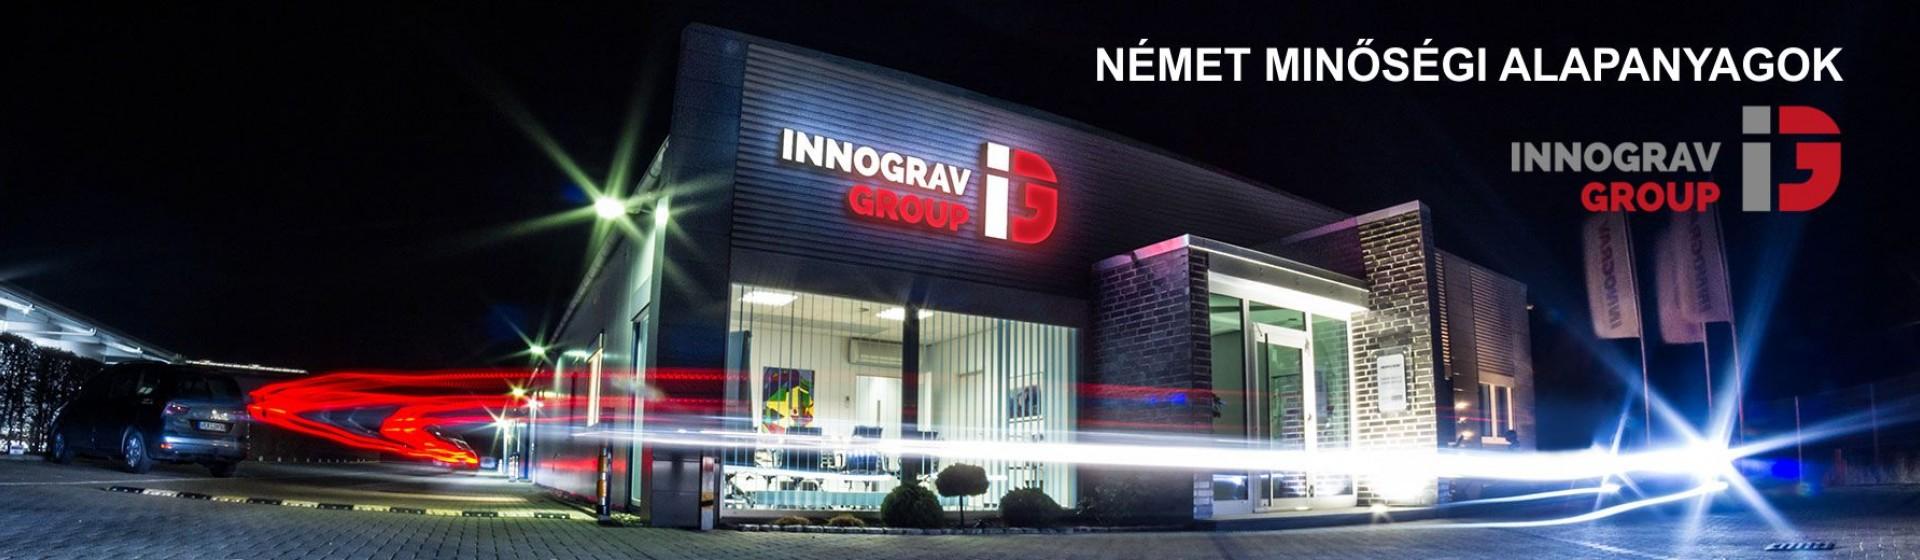 IGM Zrt. / Innograv alapanyagok forgalmazása